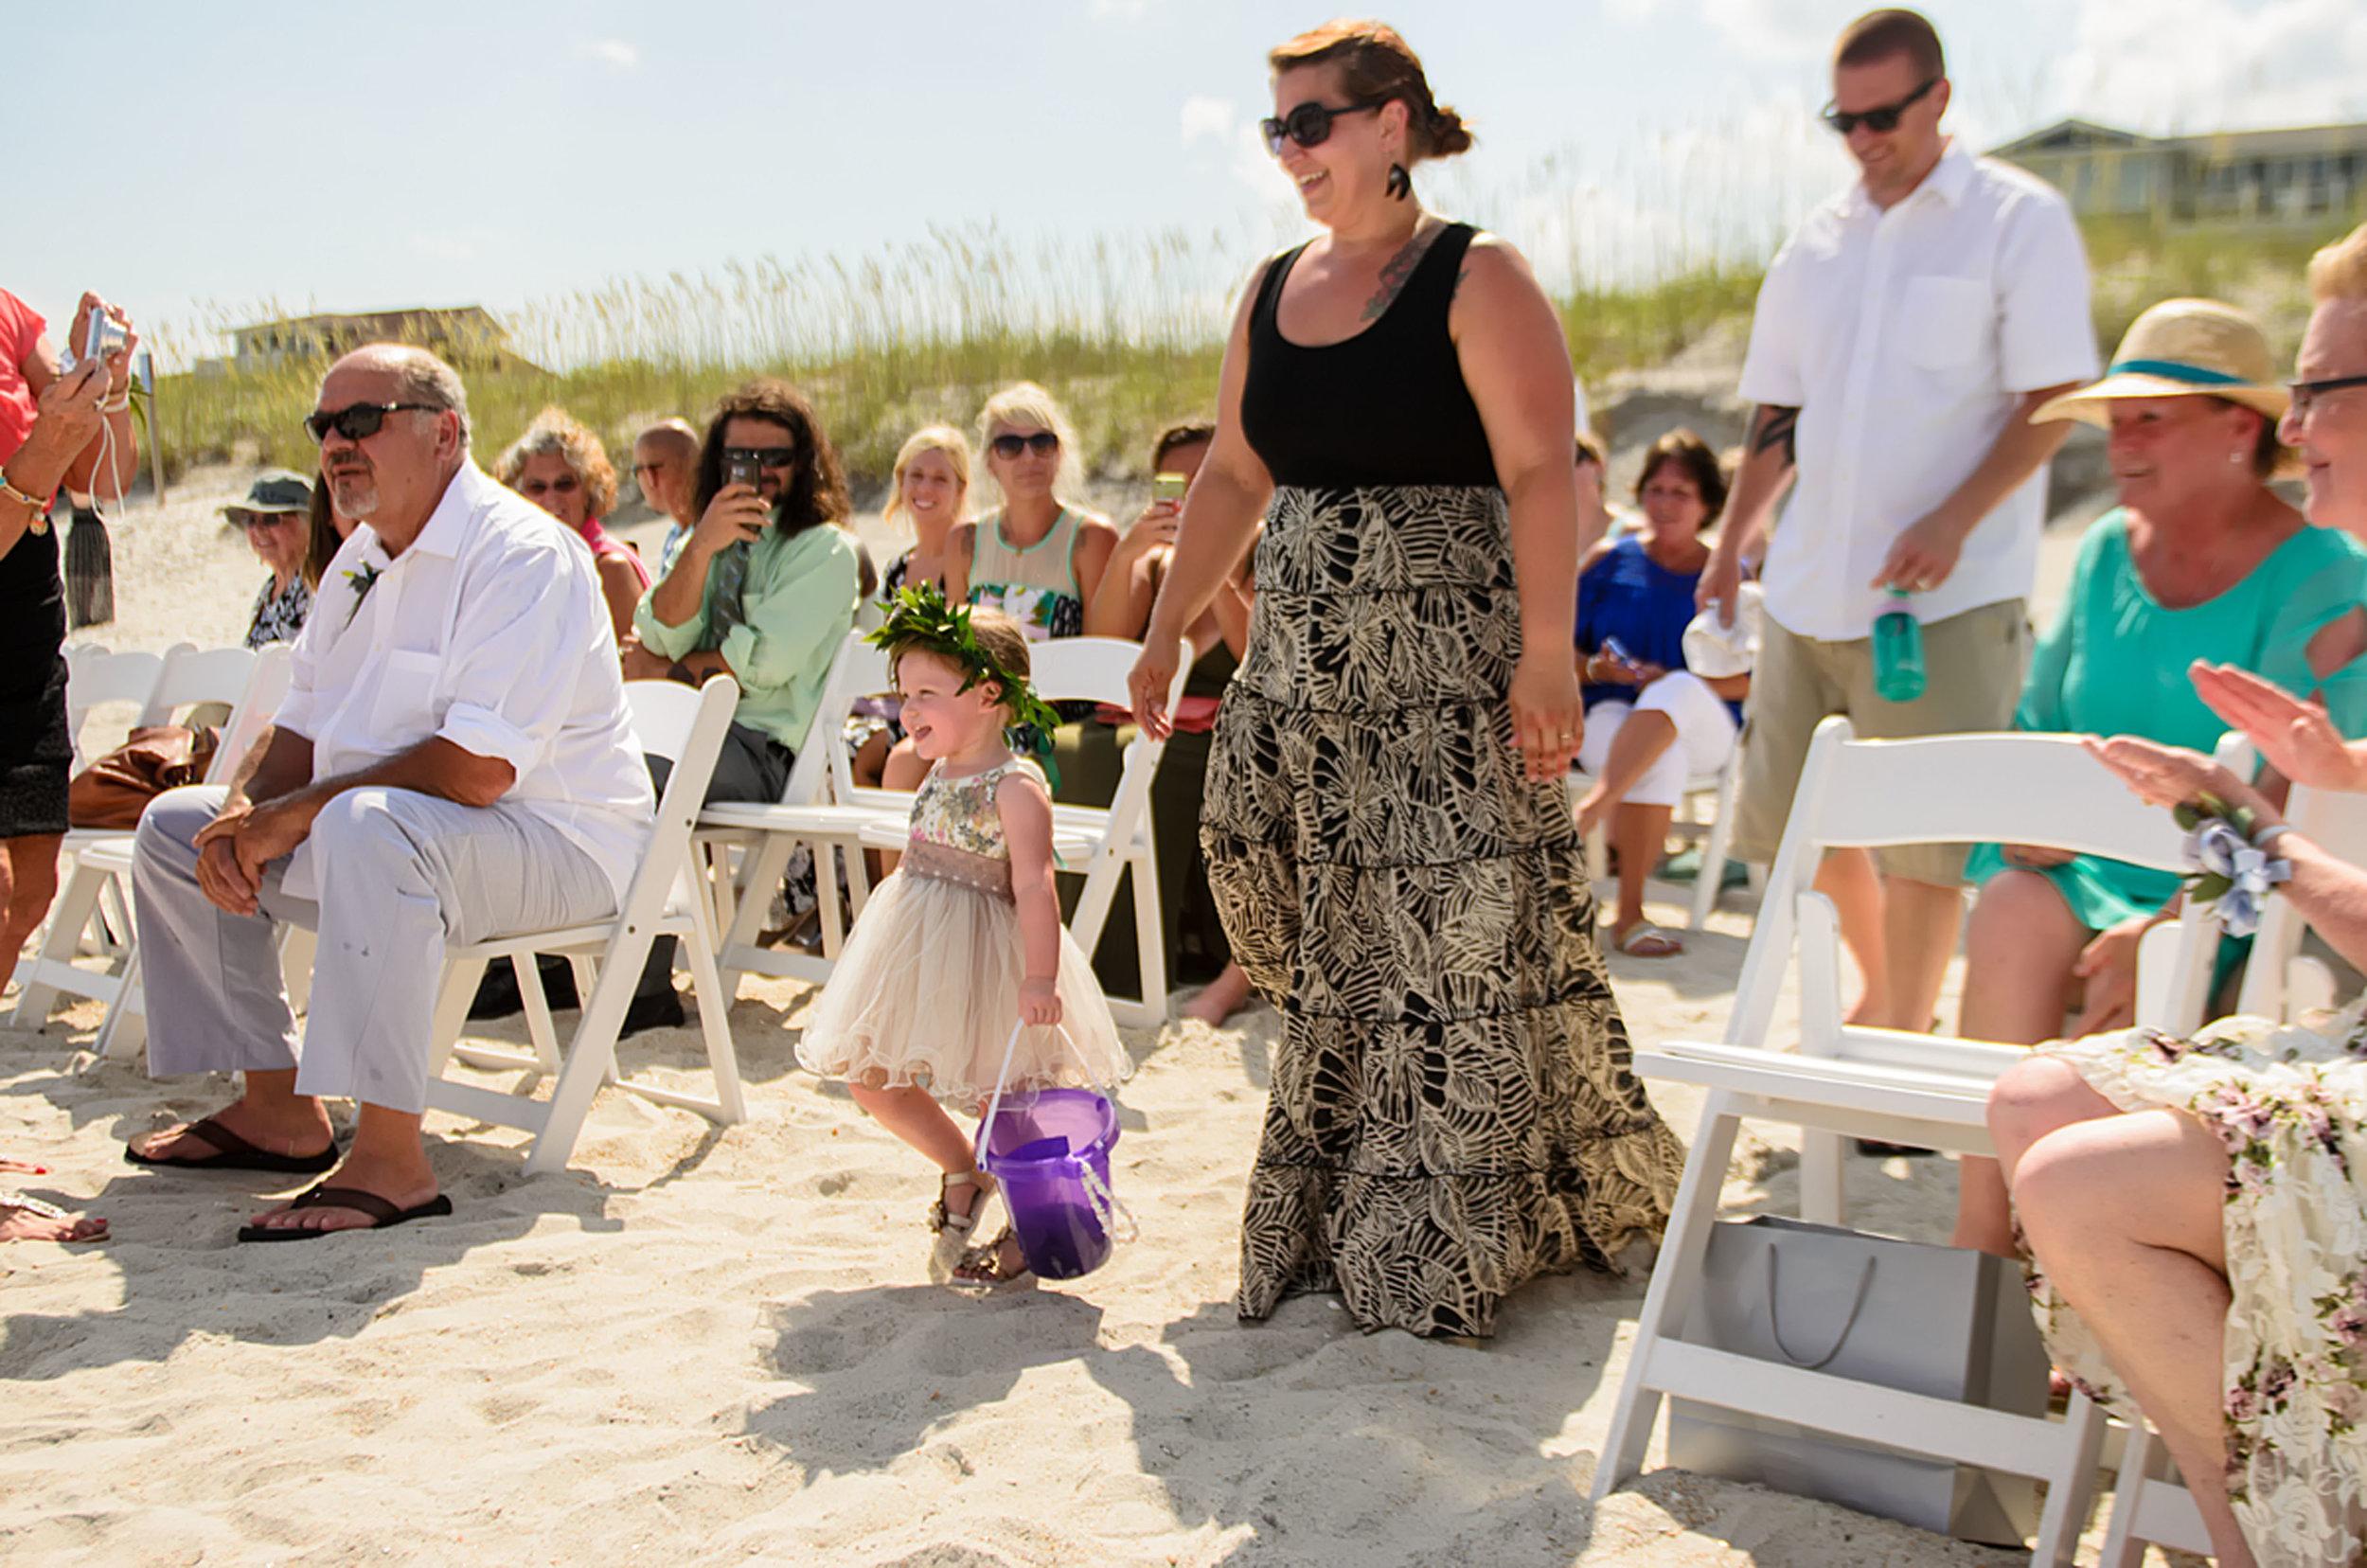 North_Carolina_Wedding_Photographer_Tiffany_Abruzzo_Ceremony_14.8.jpg